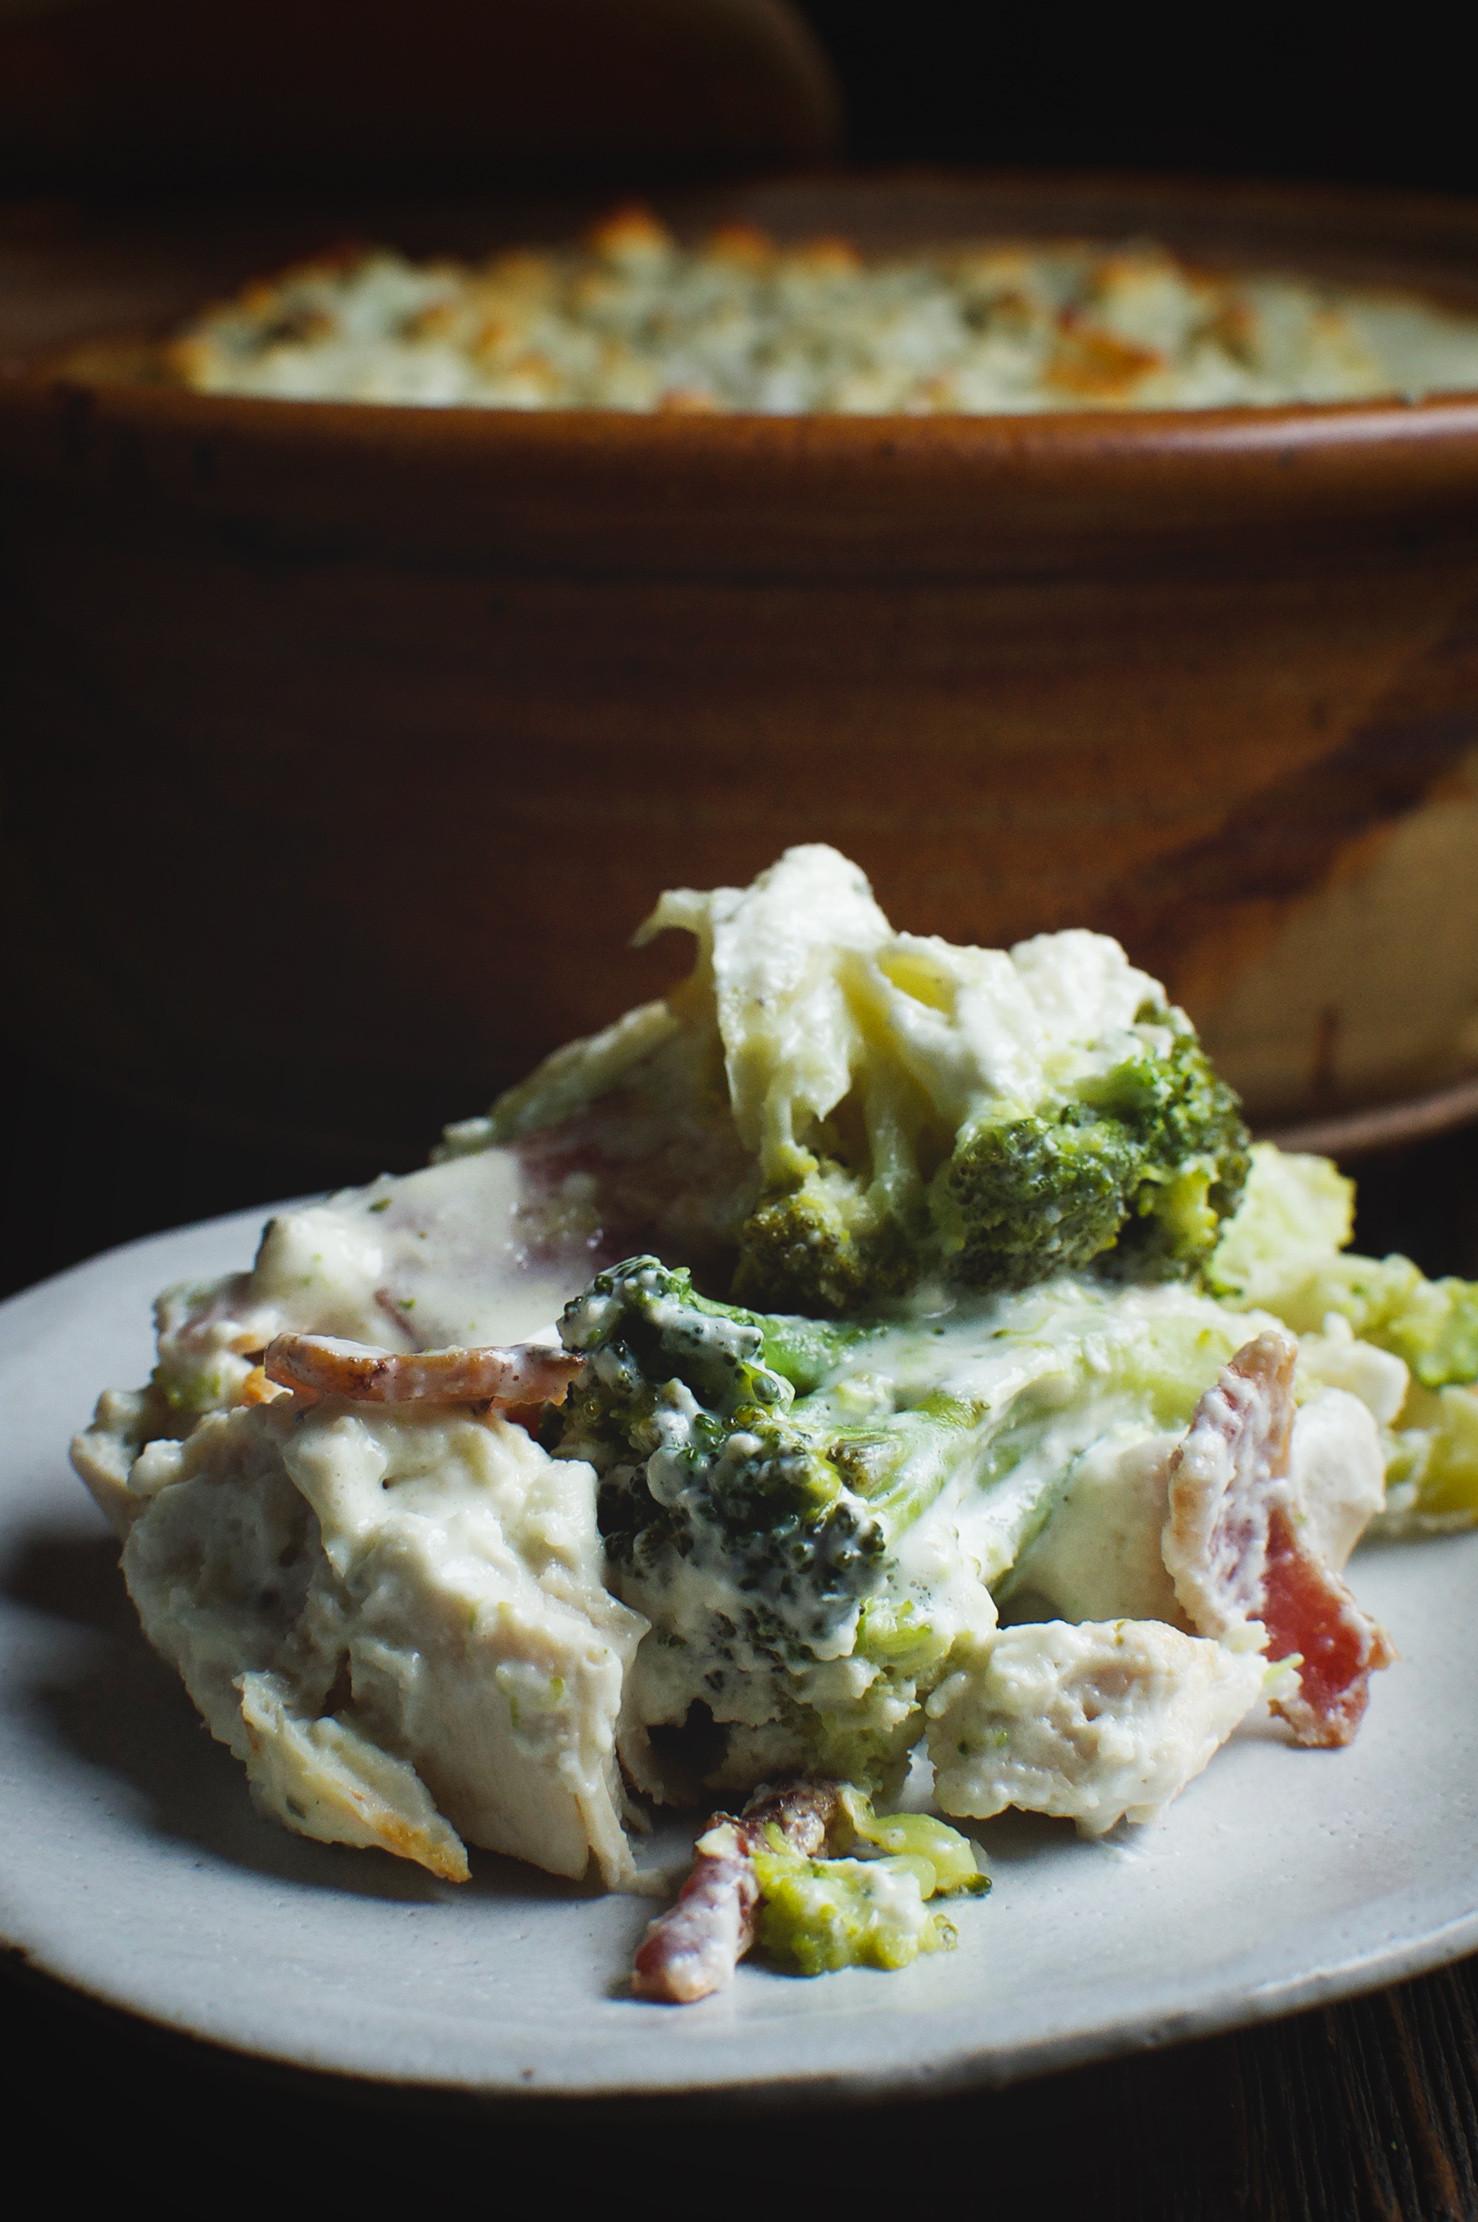 Leftover Pork Roast Casserole  Low Carb Leftover Turkey Casserole Recipe Simply So Healthy